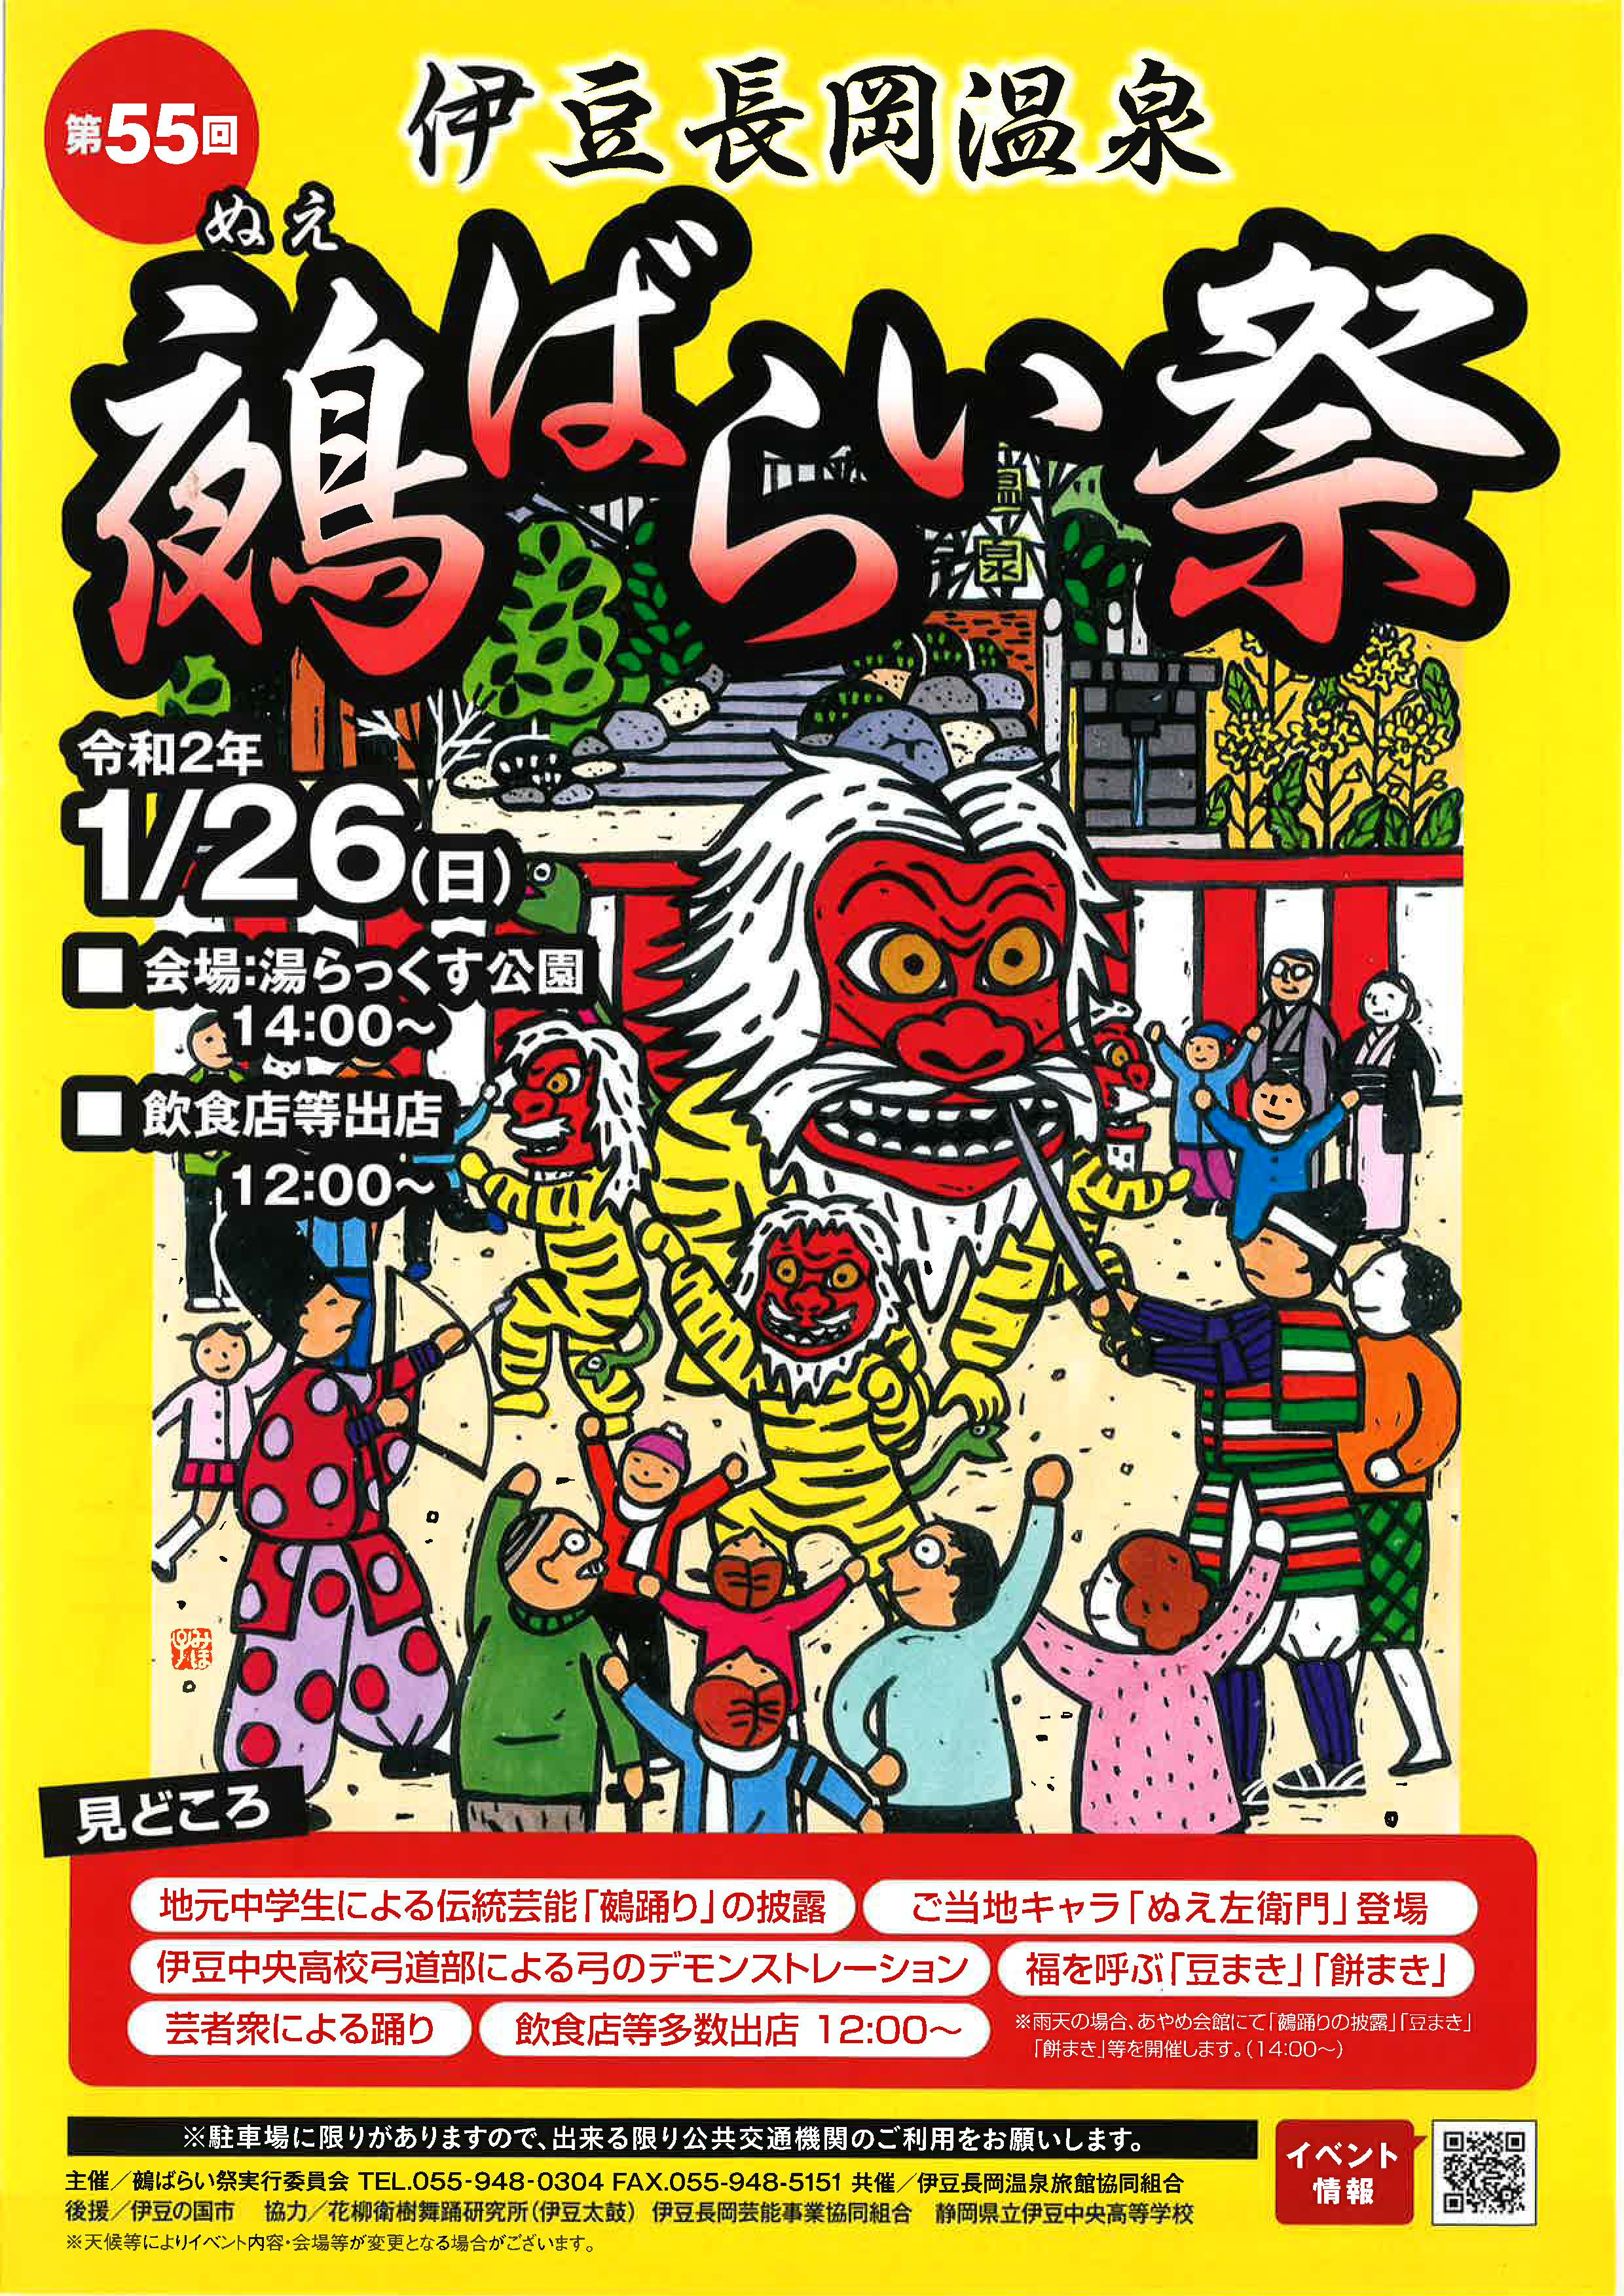 align:none link:0 alt:0 1/26(日) 伊豆長岡温泉 鵺ばらい祭開催!l